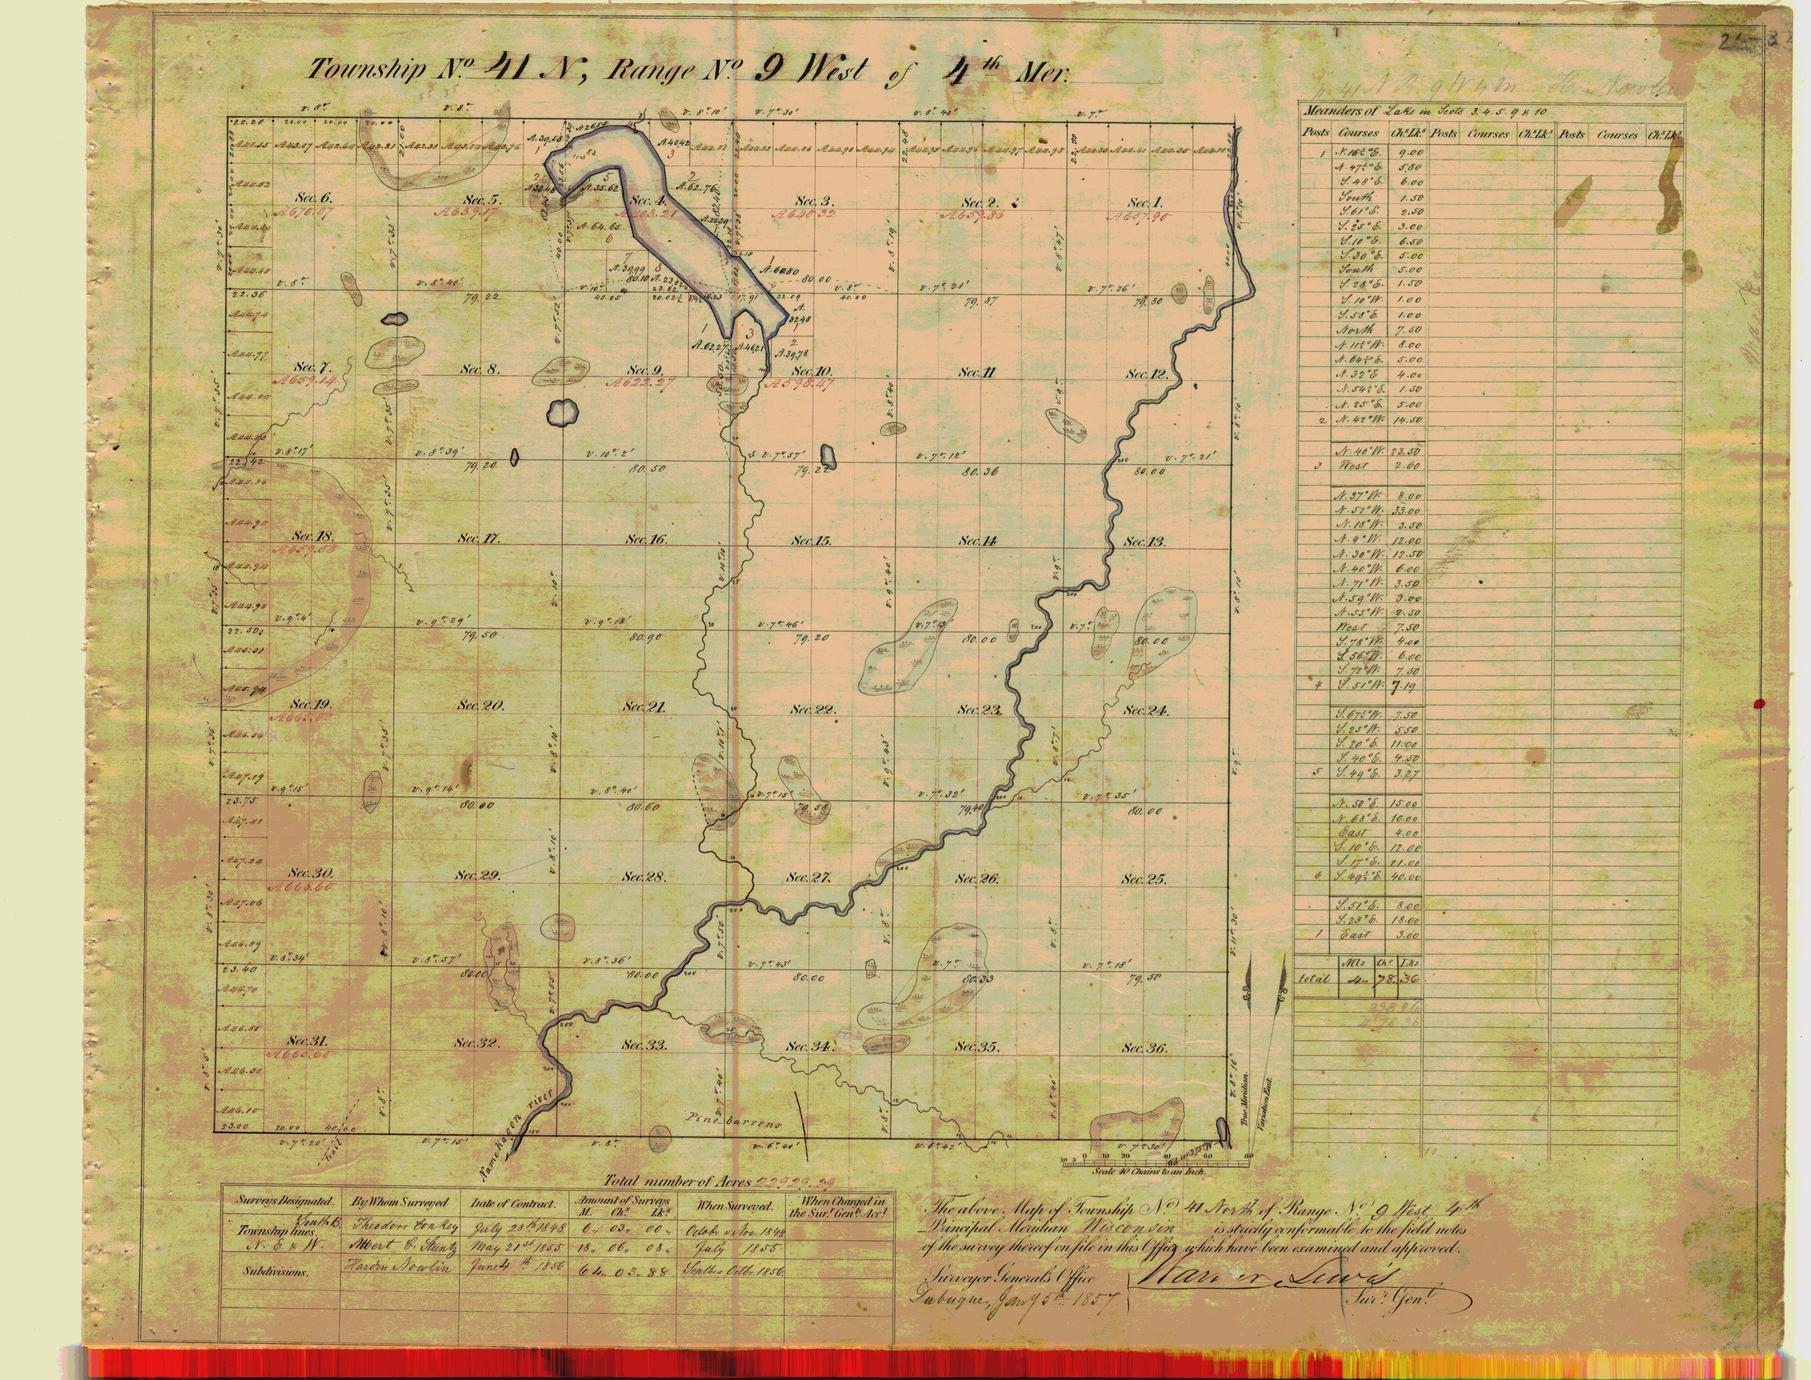 [Public Land Survey System map: Wisconsin Township 41 North, Range 09 West]